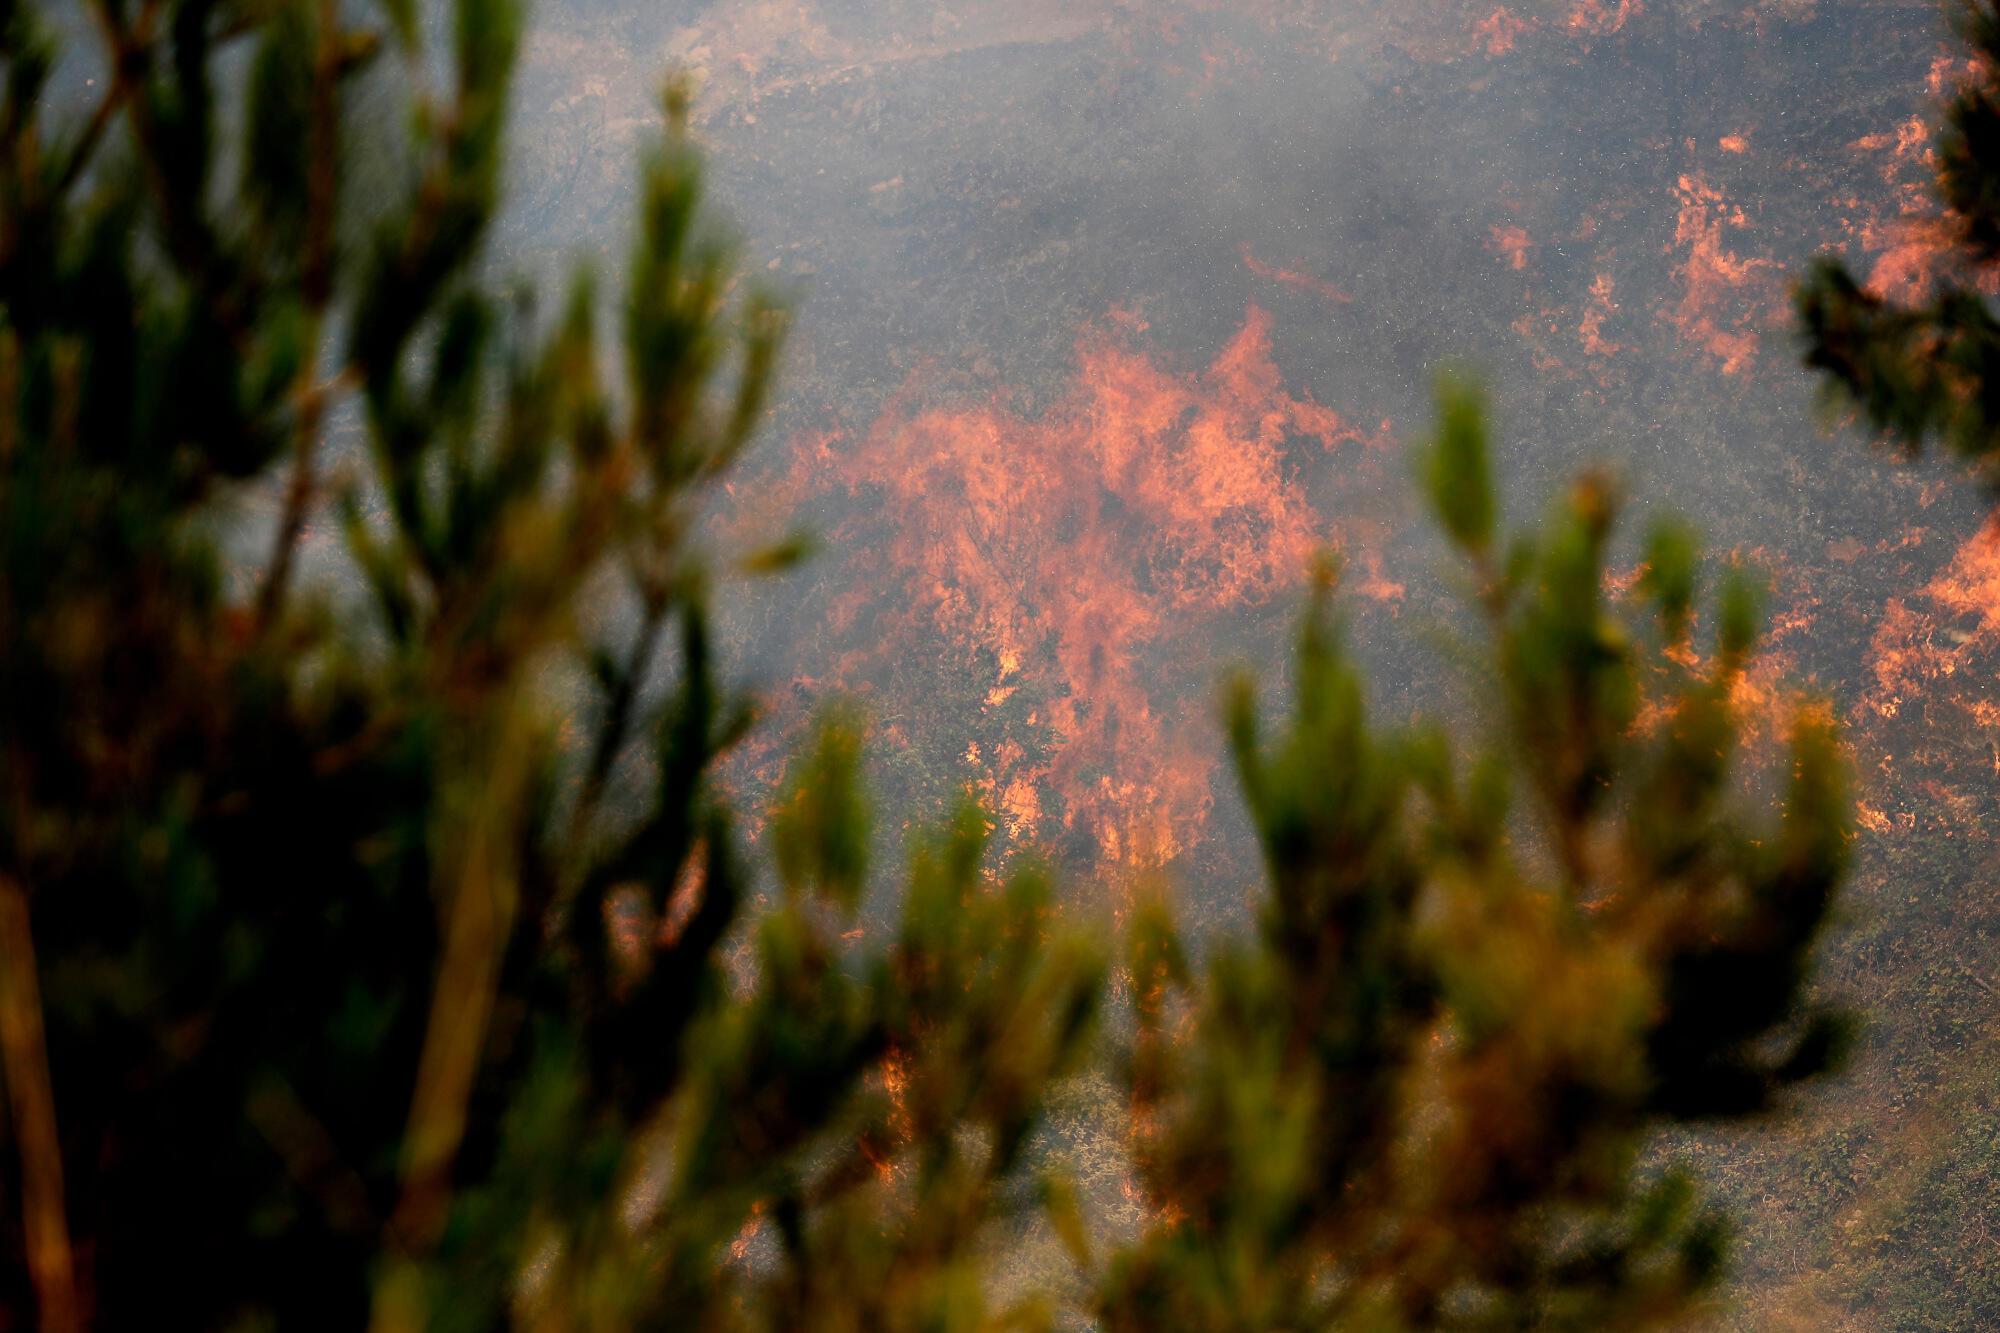 Liban - Lebanon - Feux incendie forêt